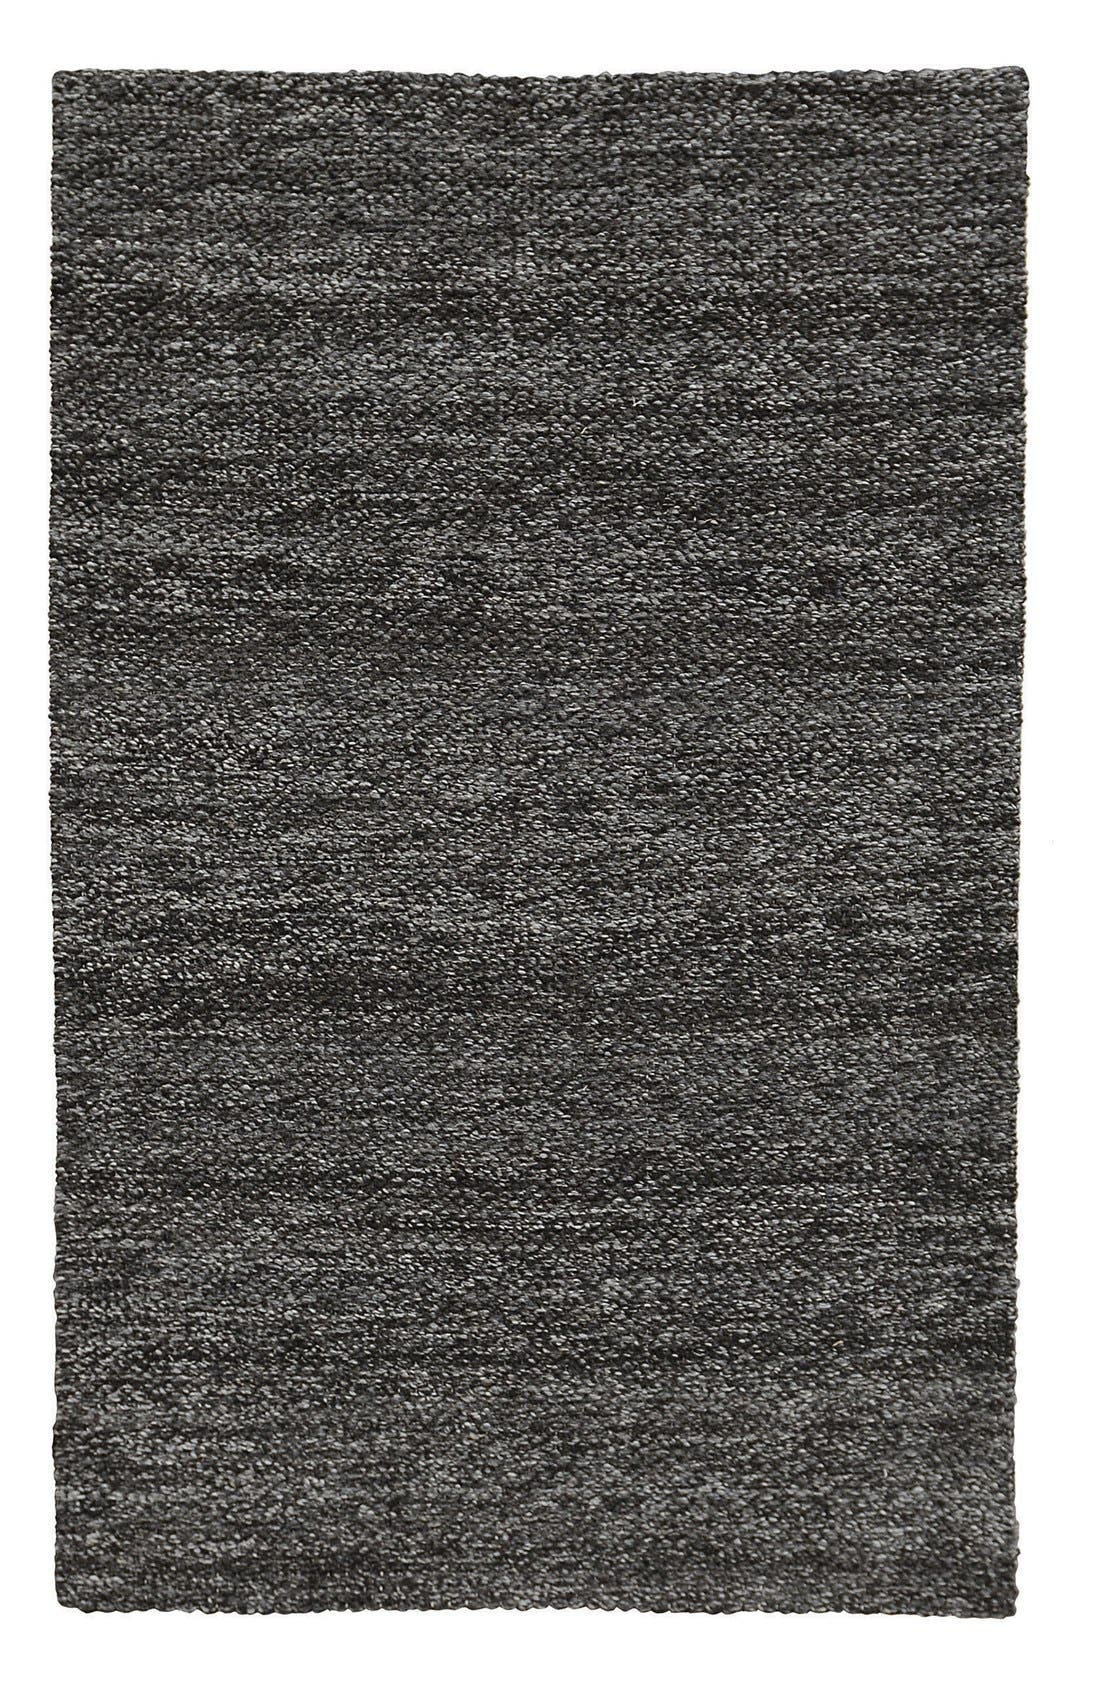 Heathered Wool Rug,                         Main,                         color, 001